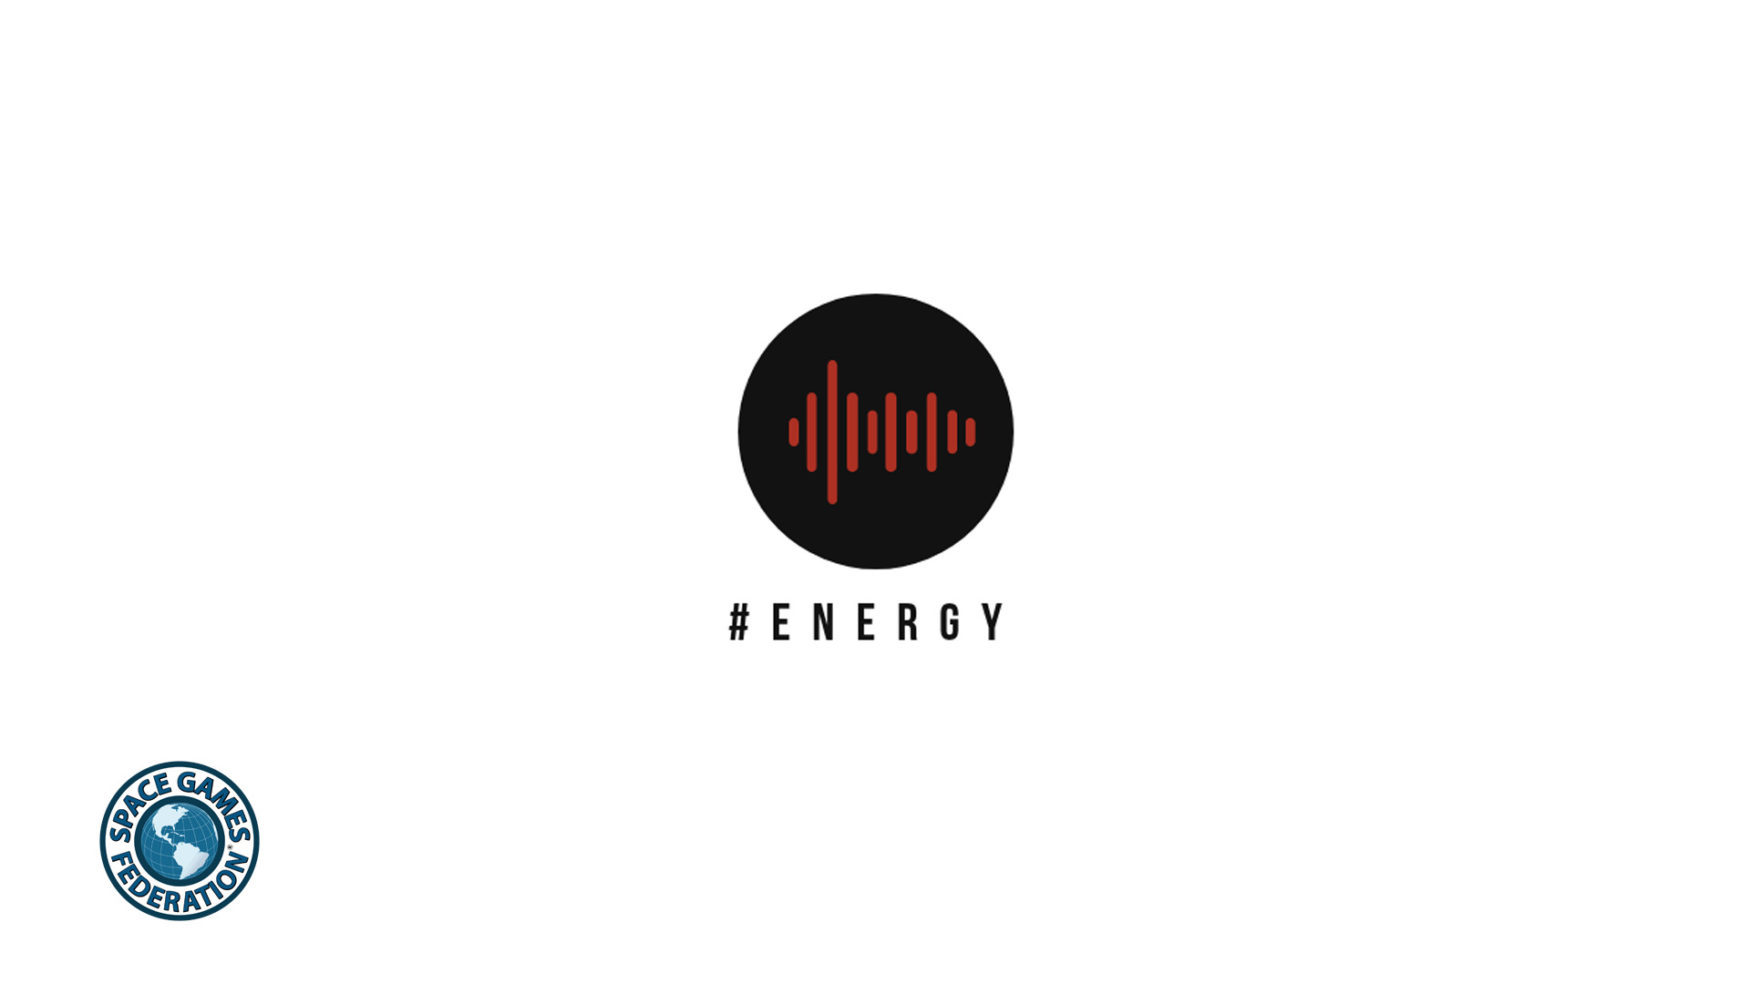 16). #Energy